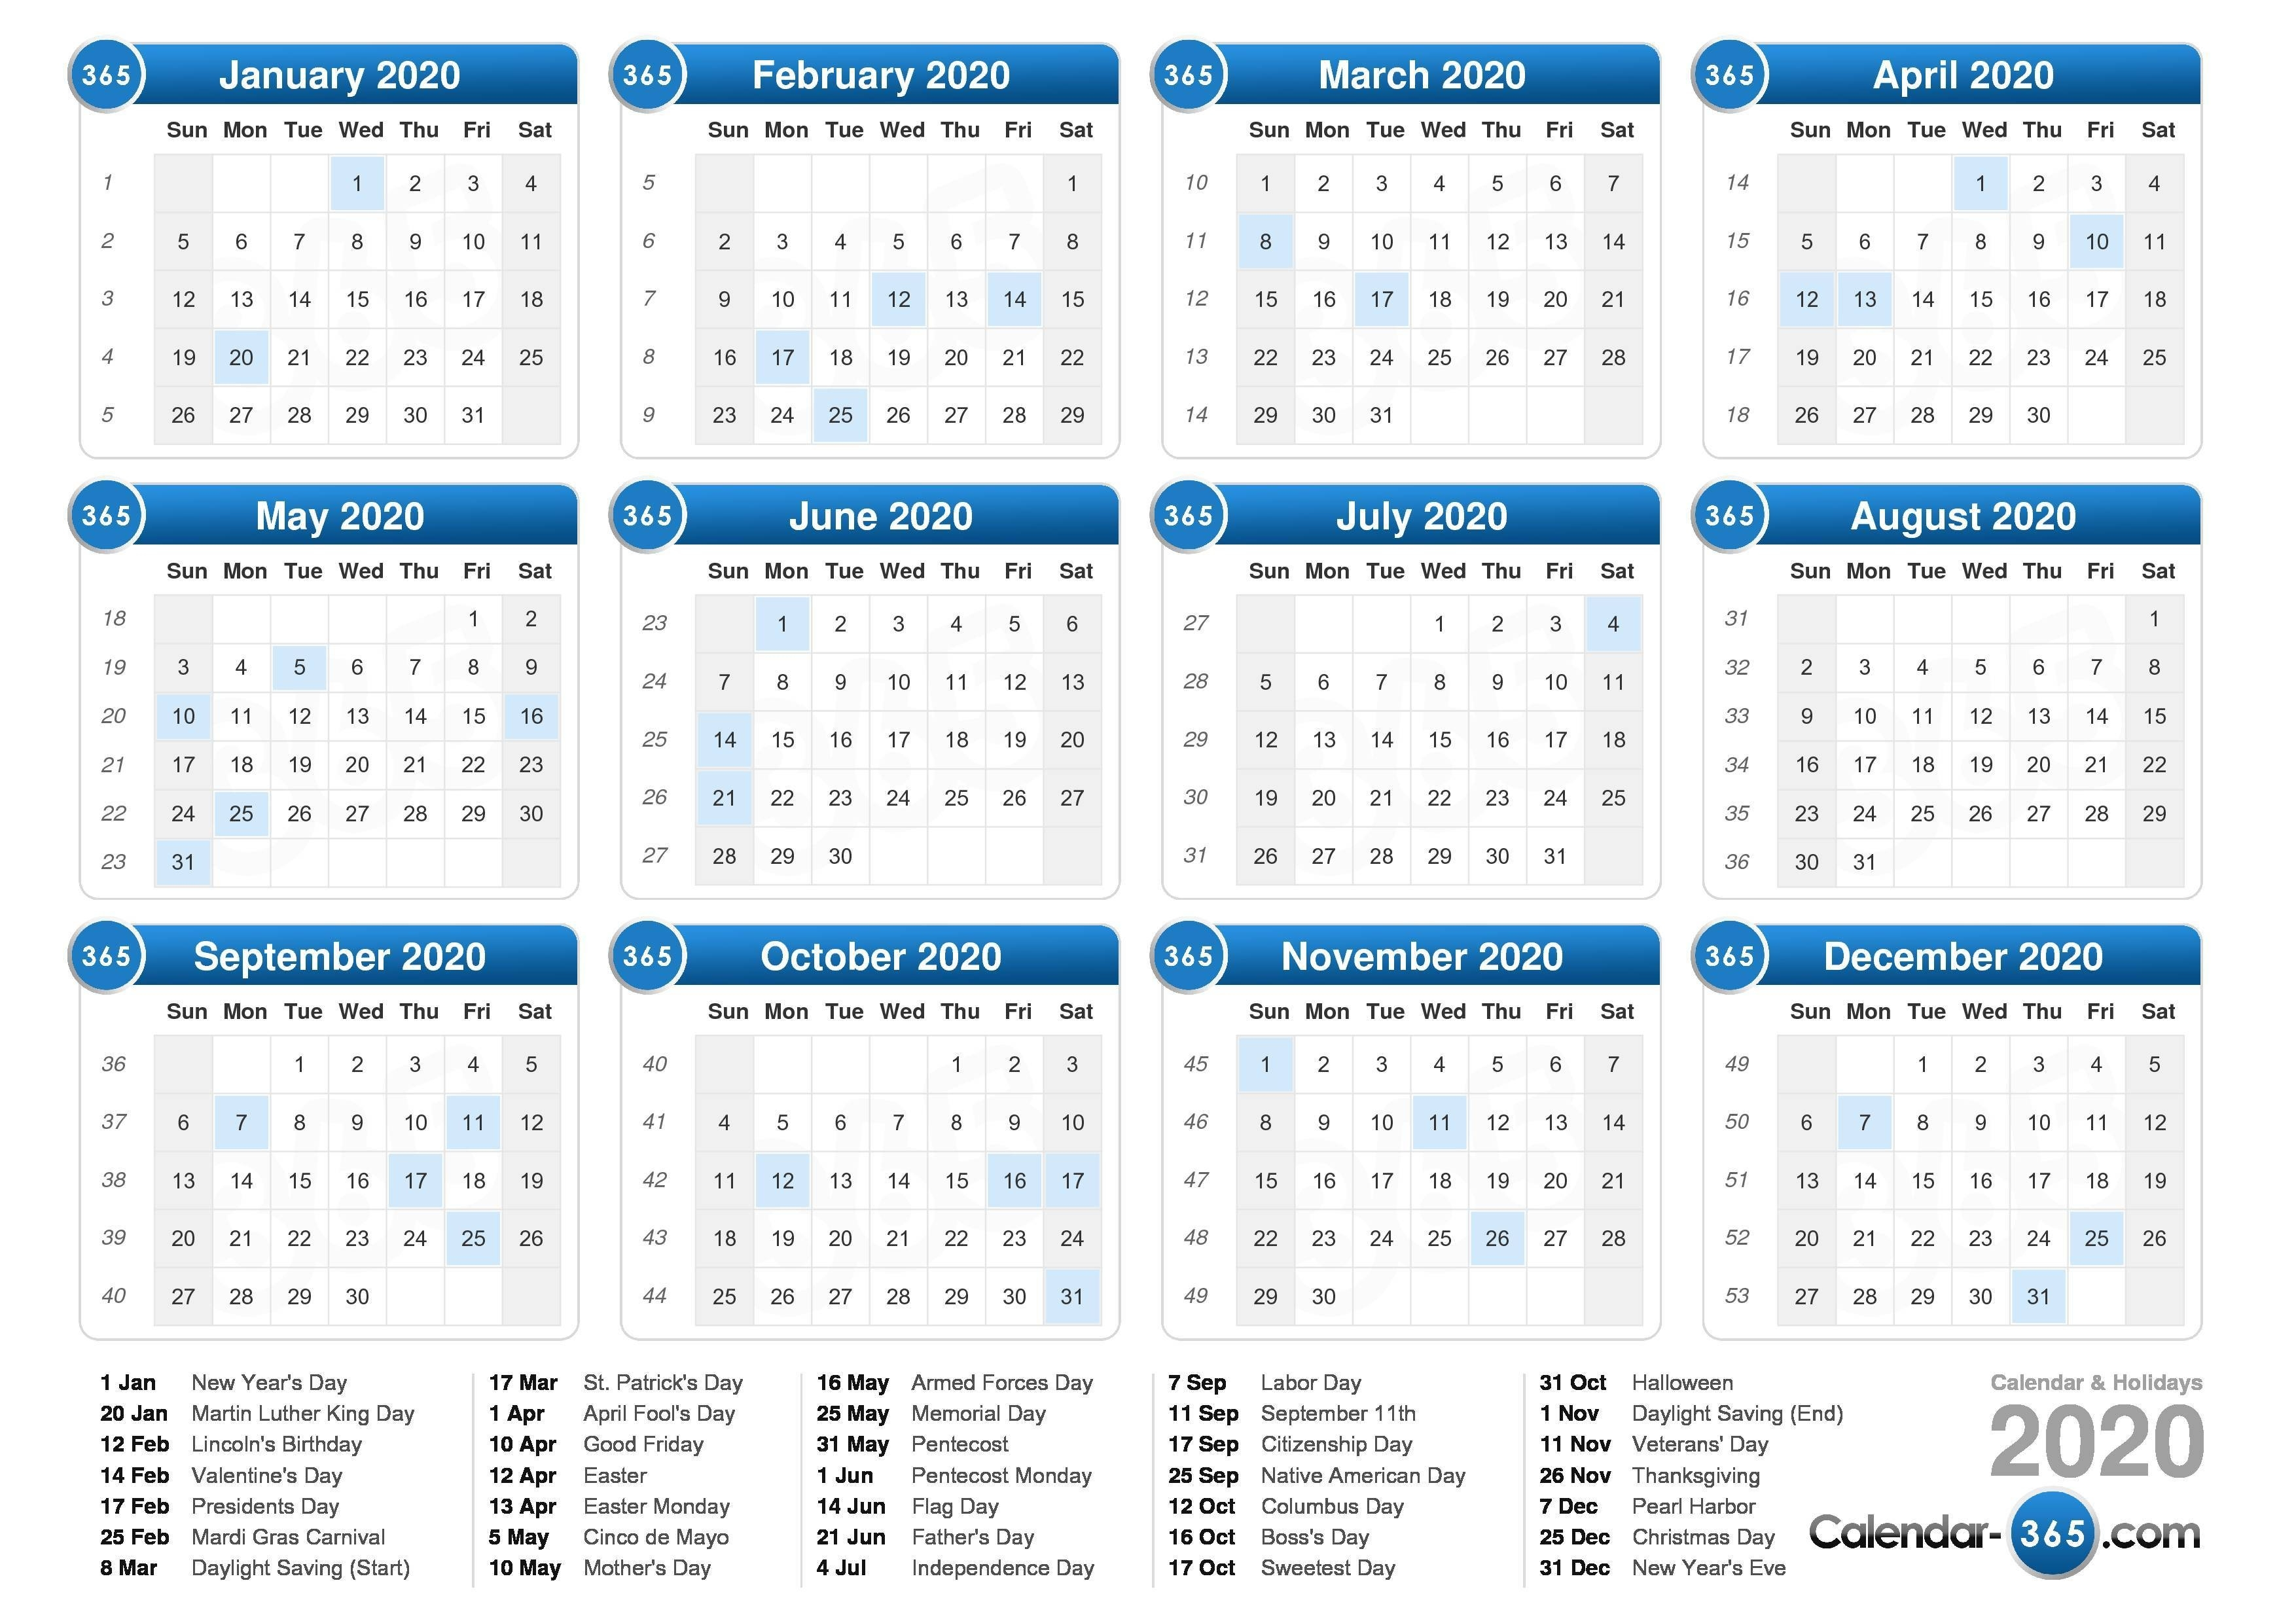 2020 Calendar-Holidays 2020 South Africa